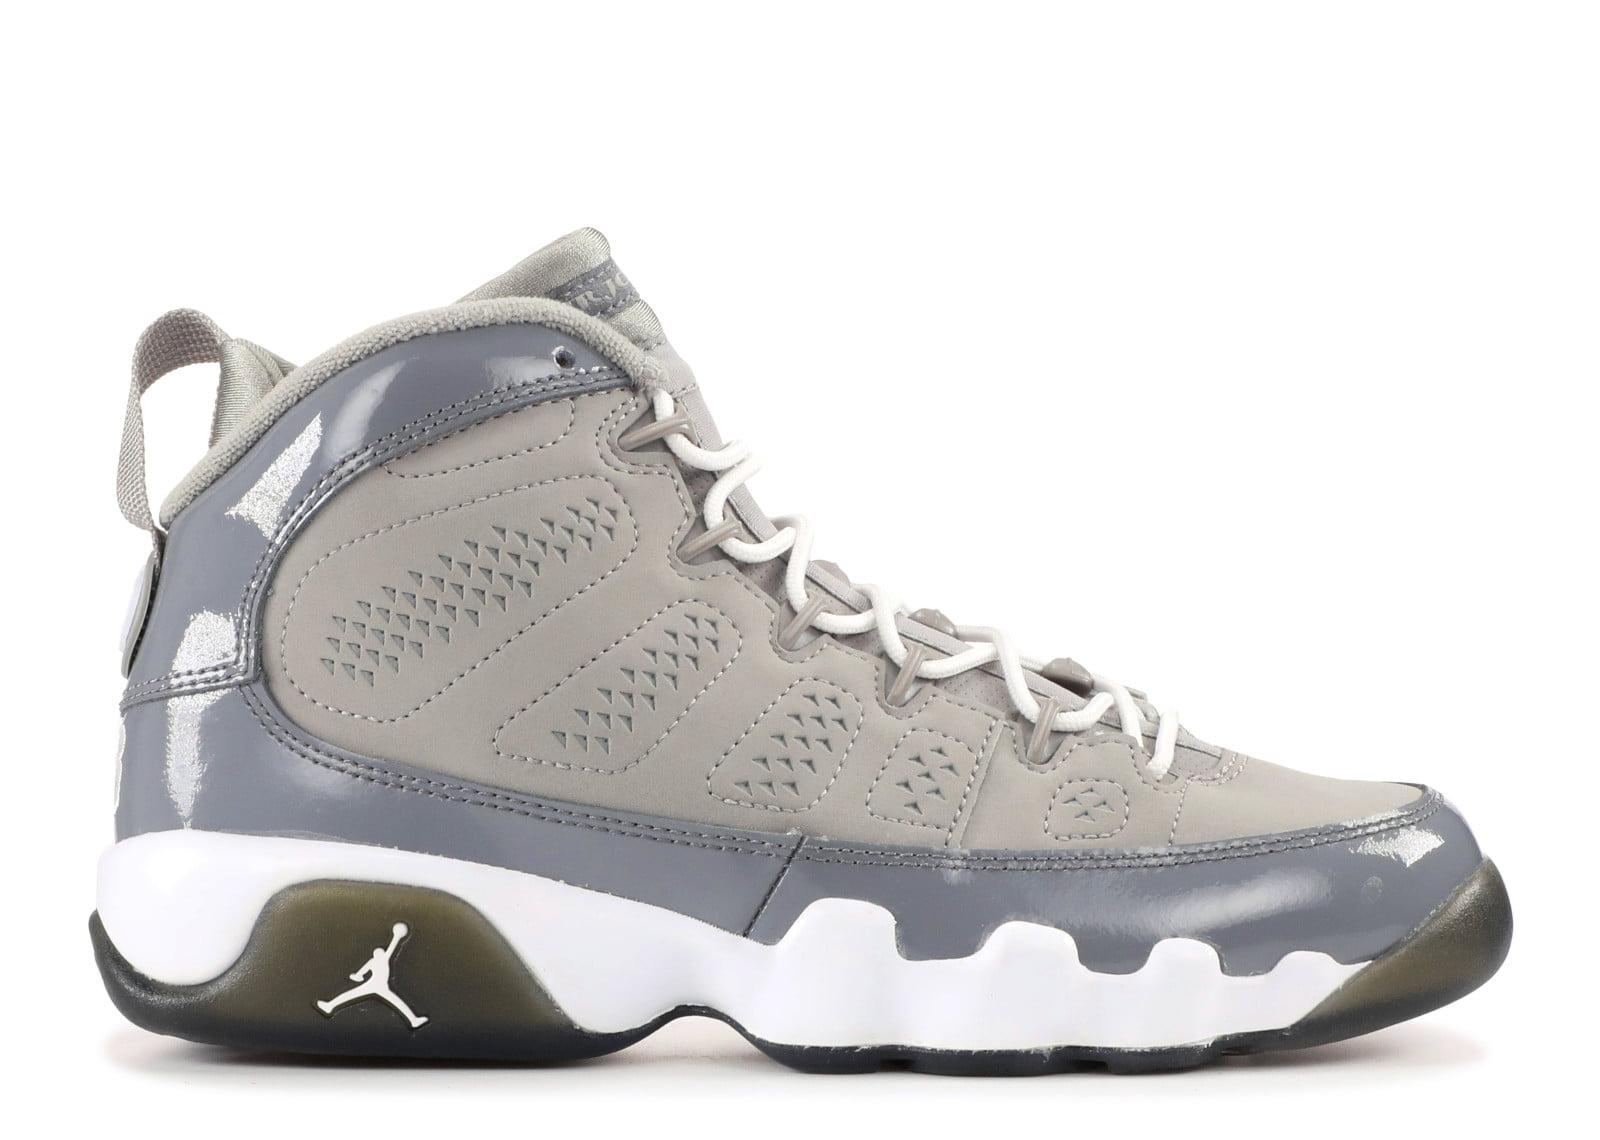 Air Jordan 9 Retro (Gs) 'Cool Grey 2012